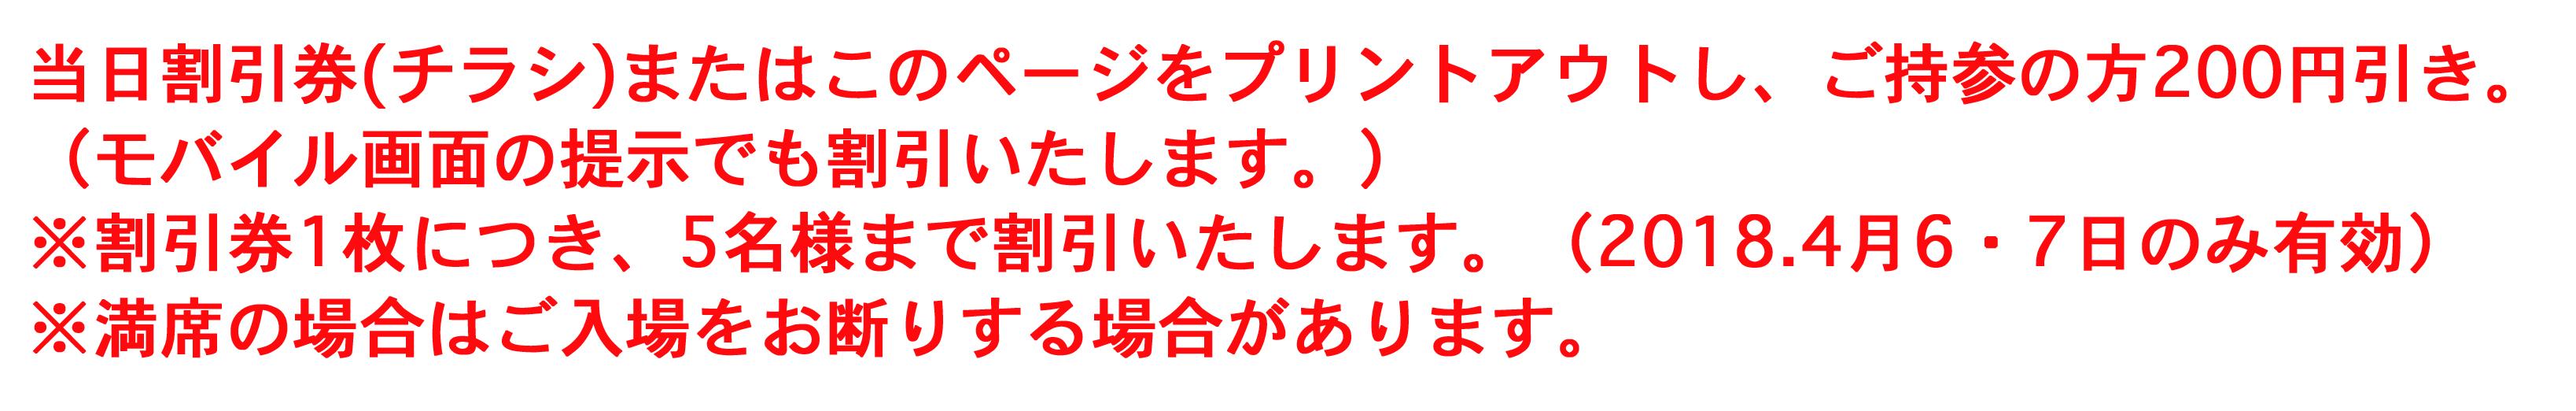 http://www.suncityhall.jp/%E5%89%B2%E5%BC%95400%E5%9B%9E.jpg